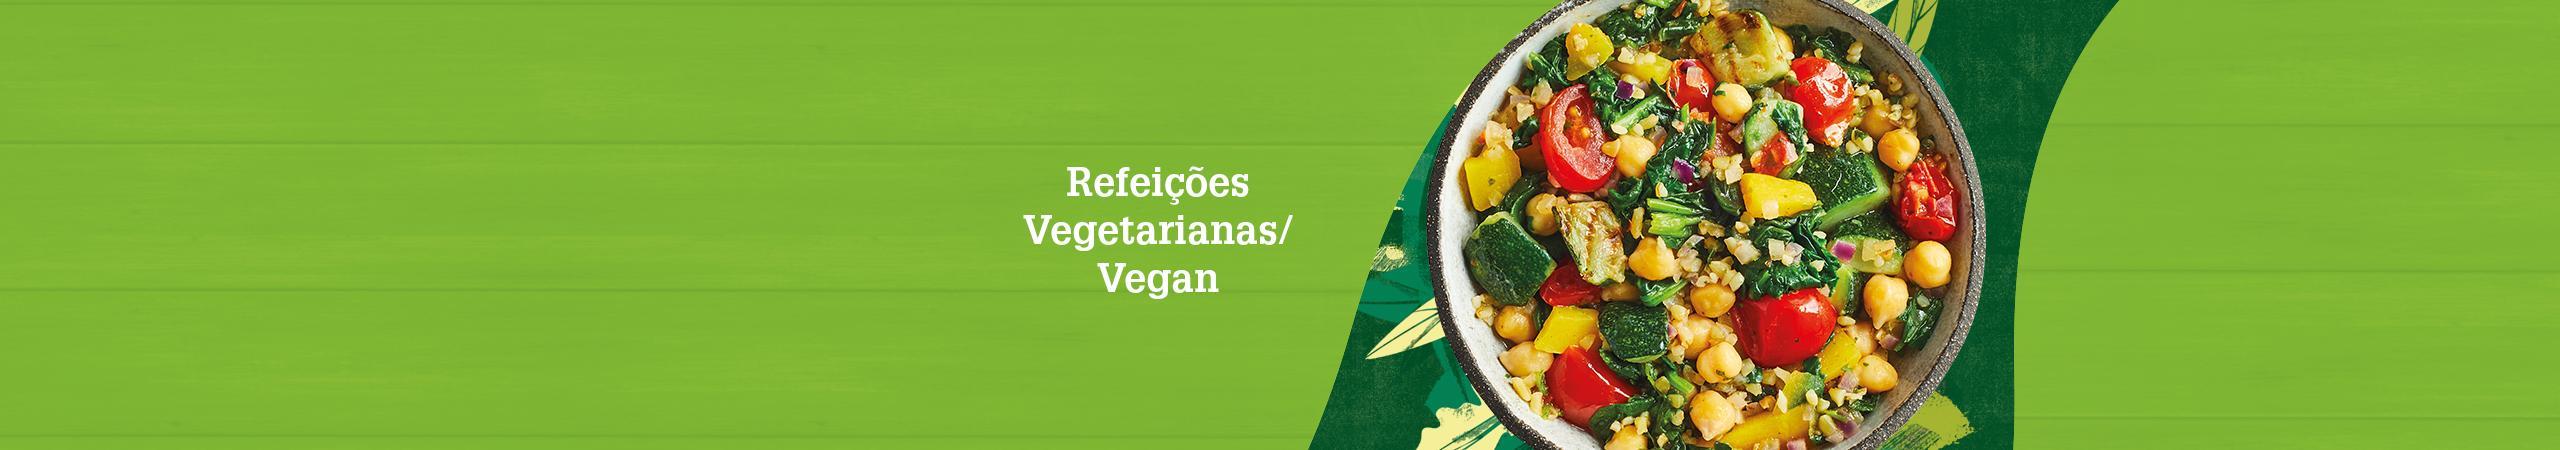 Refeições Vegetarianas Iglo